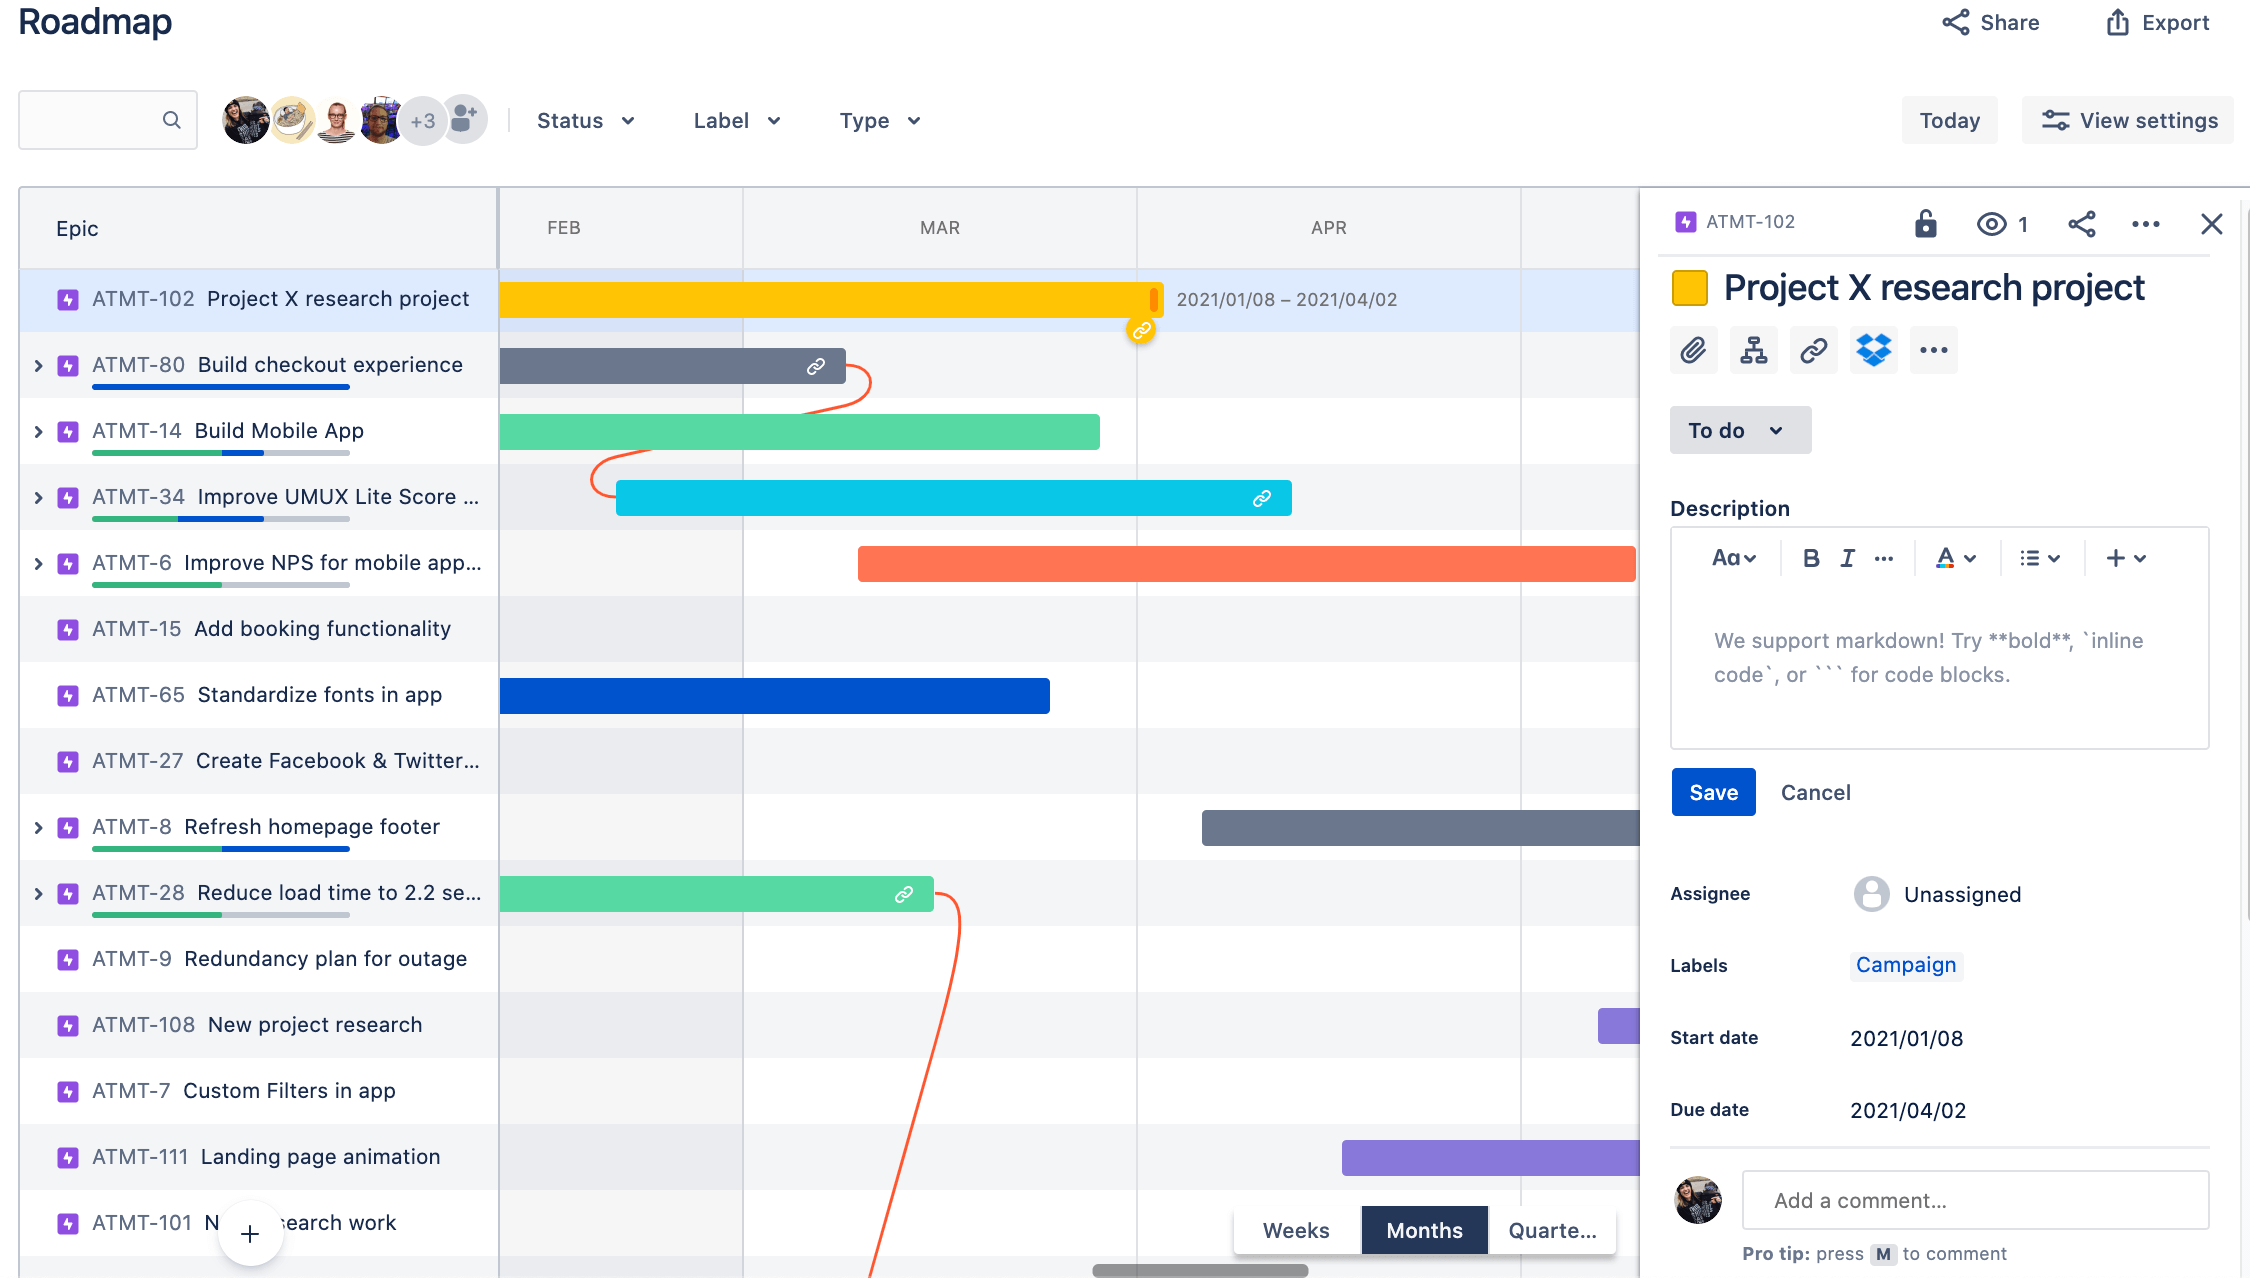 Jira Software の Basic Roadmaps におけるエピックの開始日と終了日